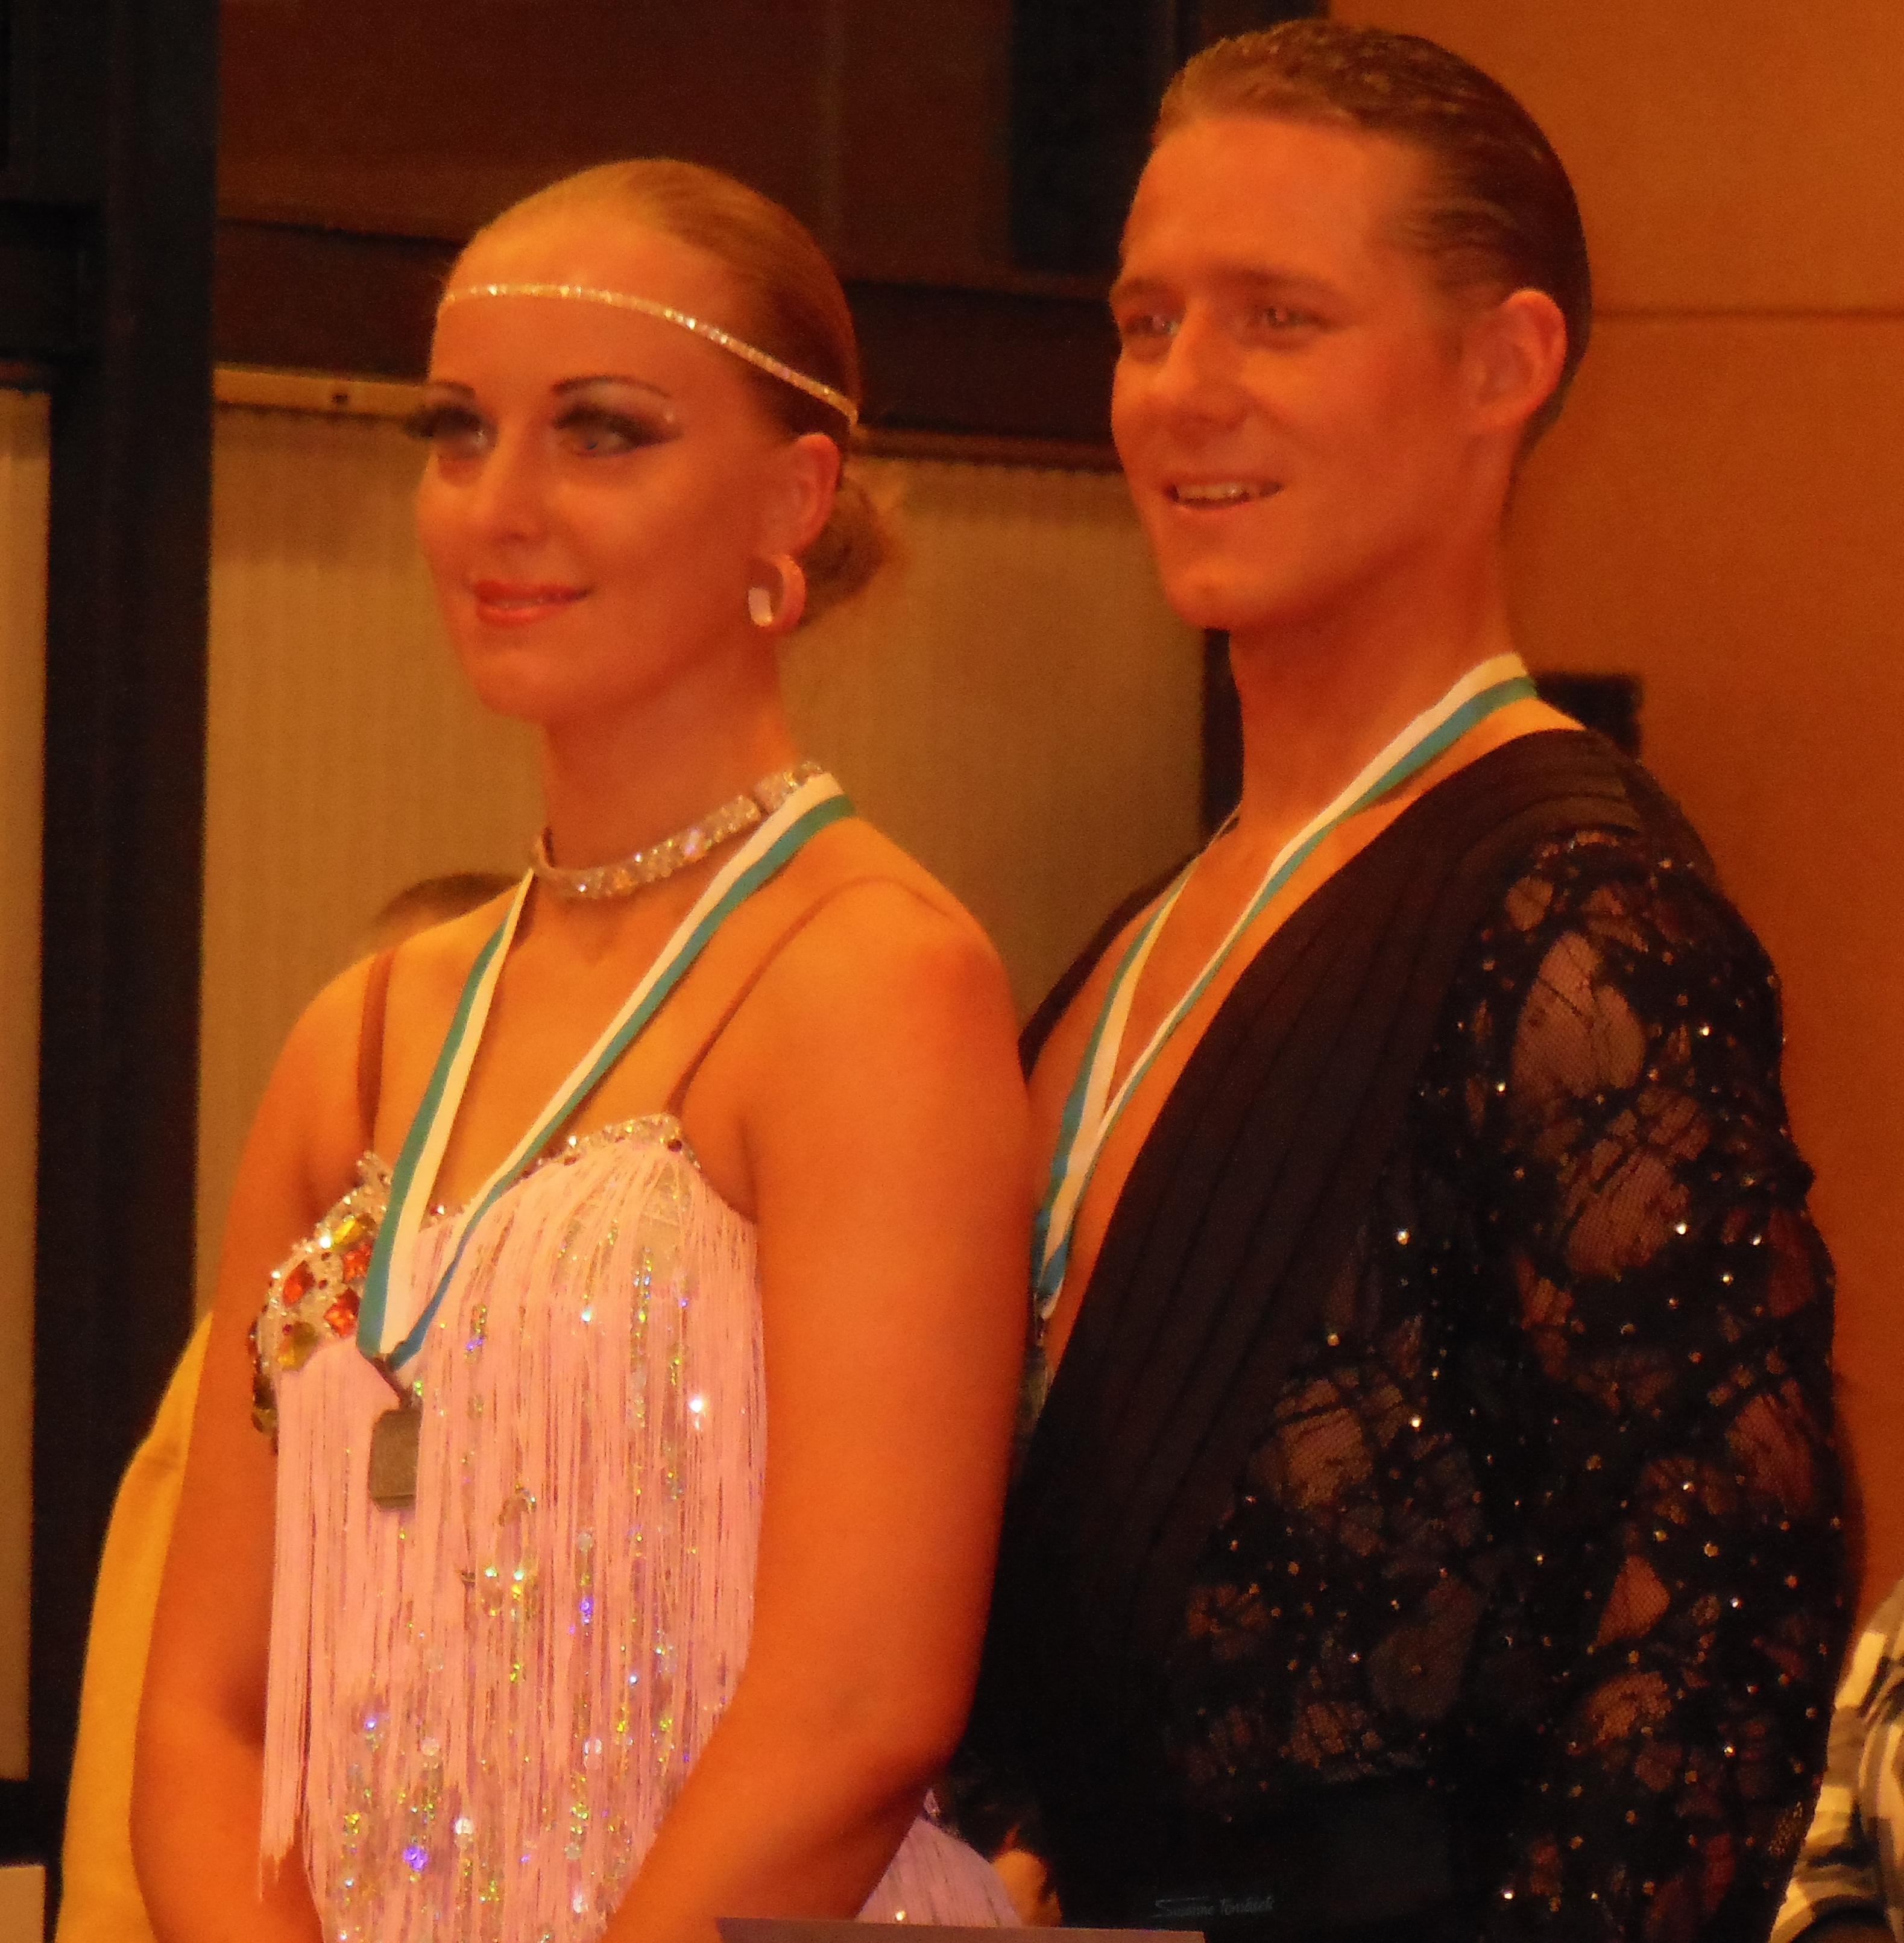 Christian Spiegl & Katharina Plage